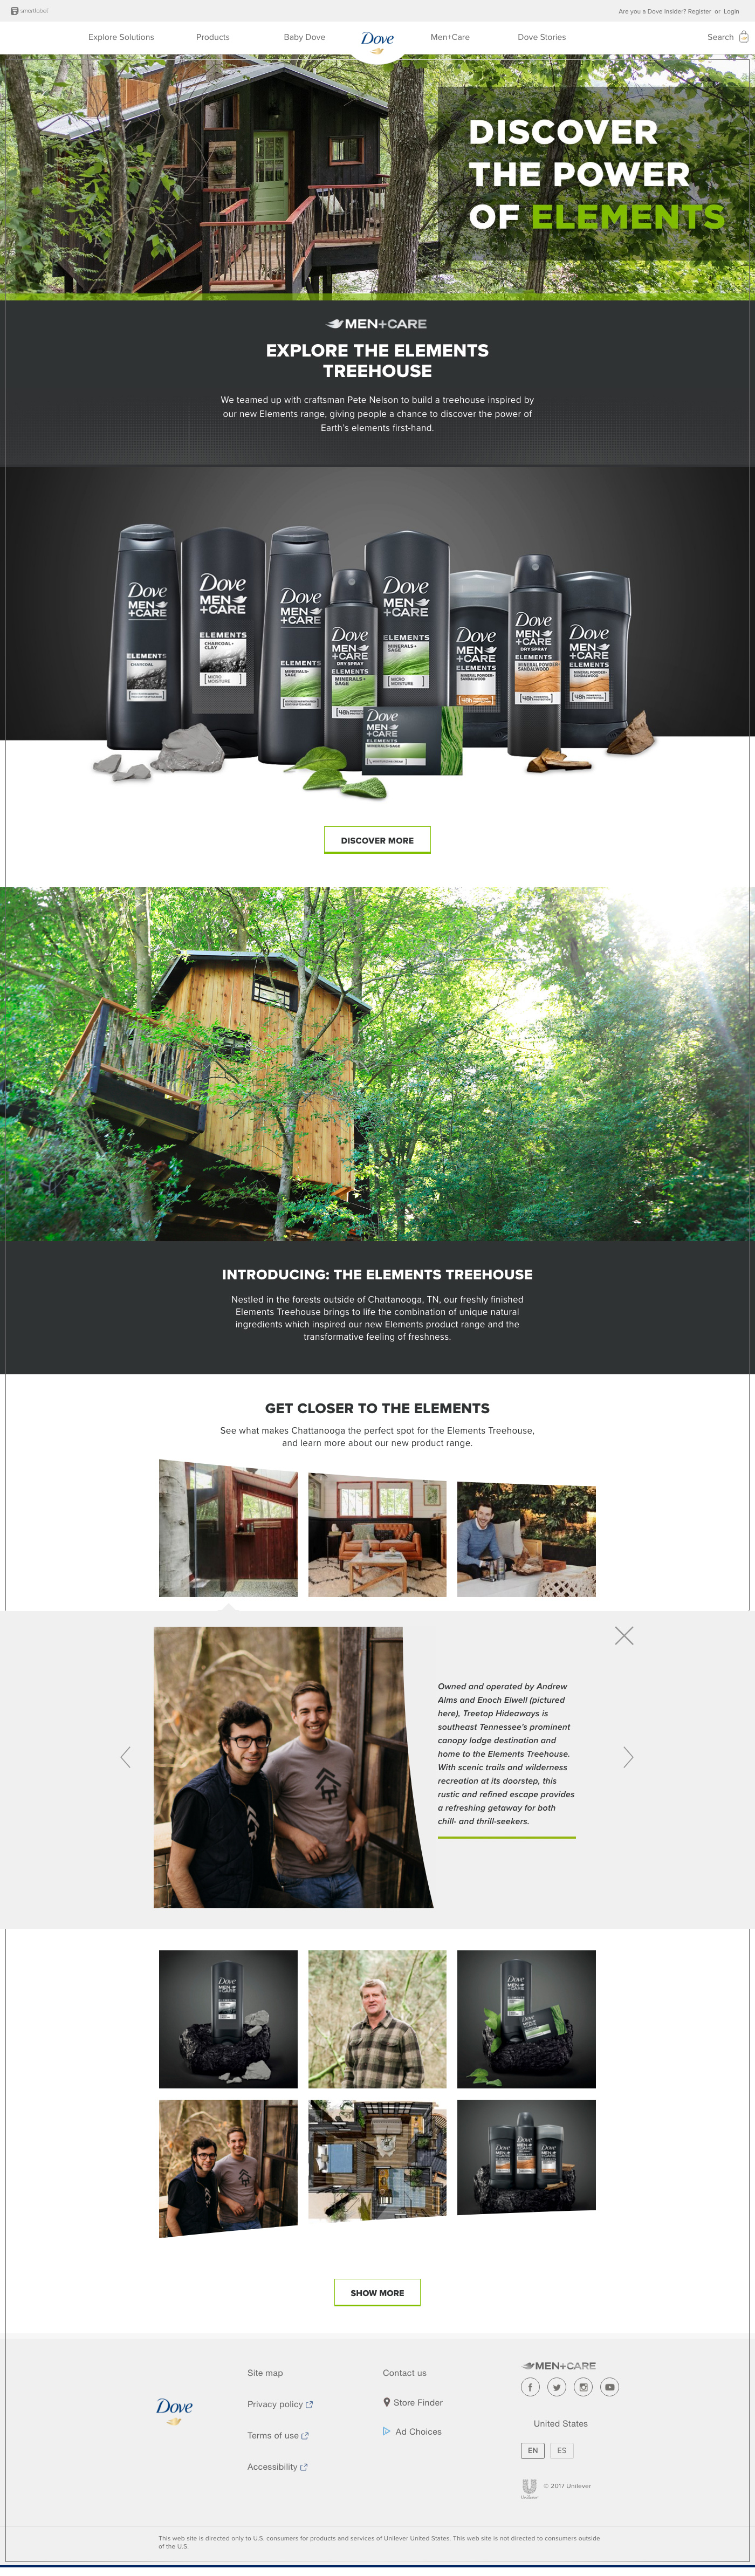 treehouse-psde.jpg